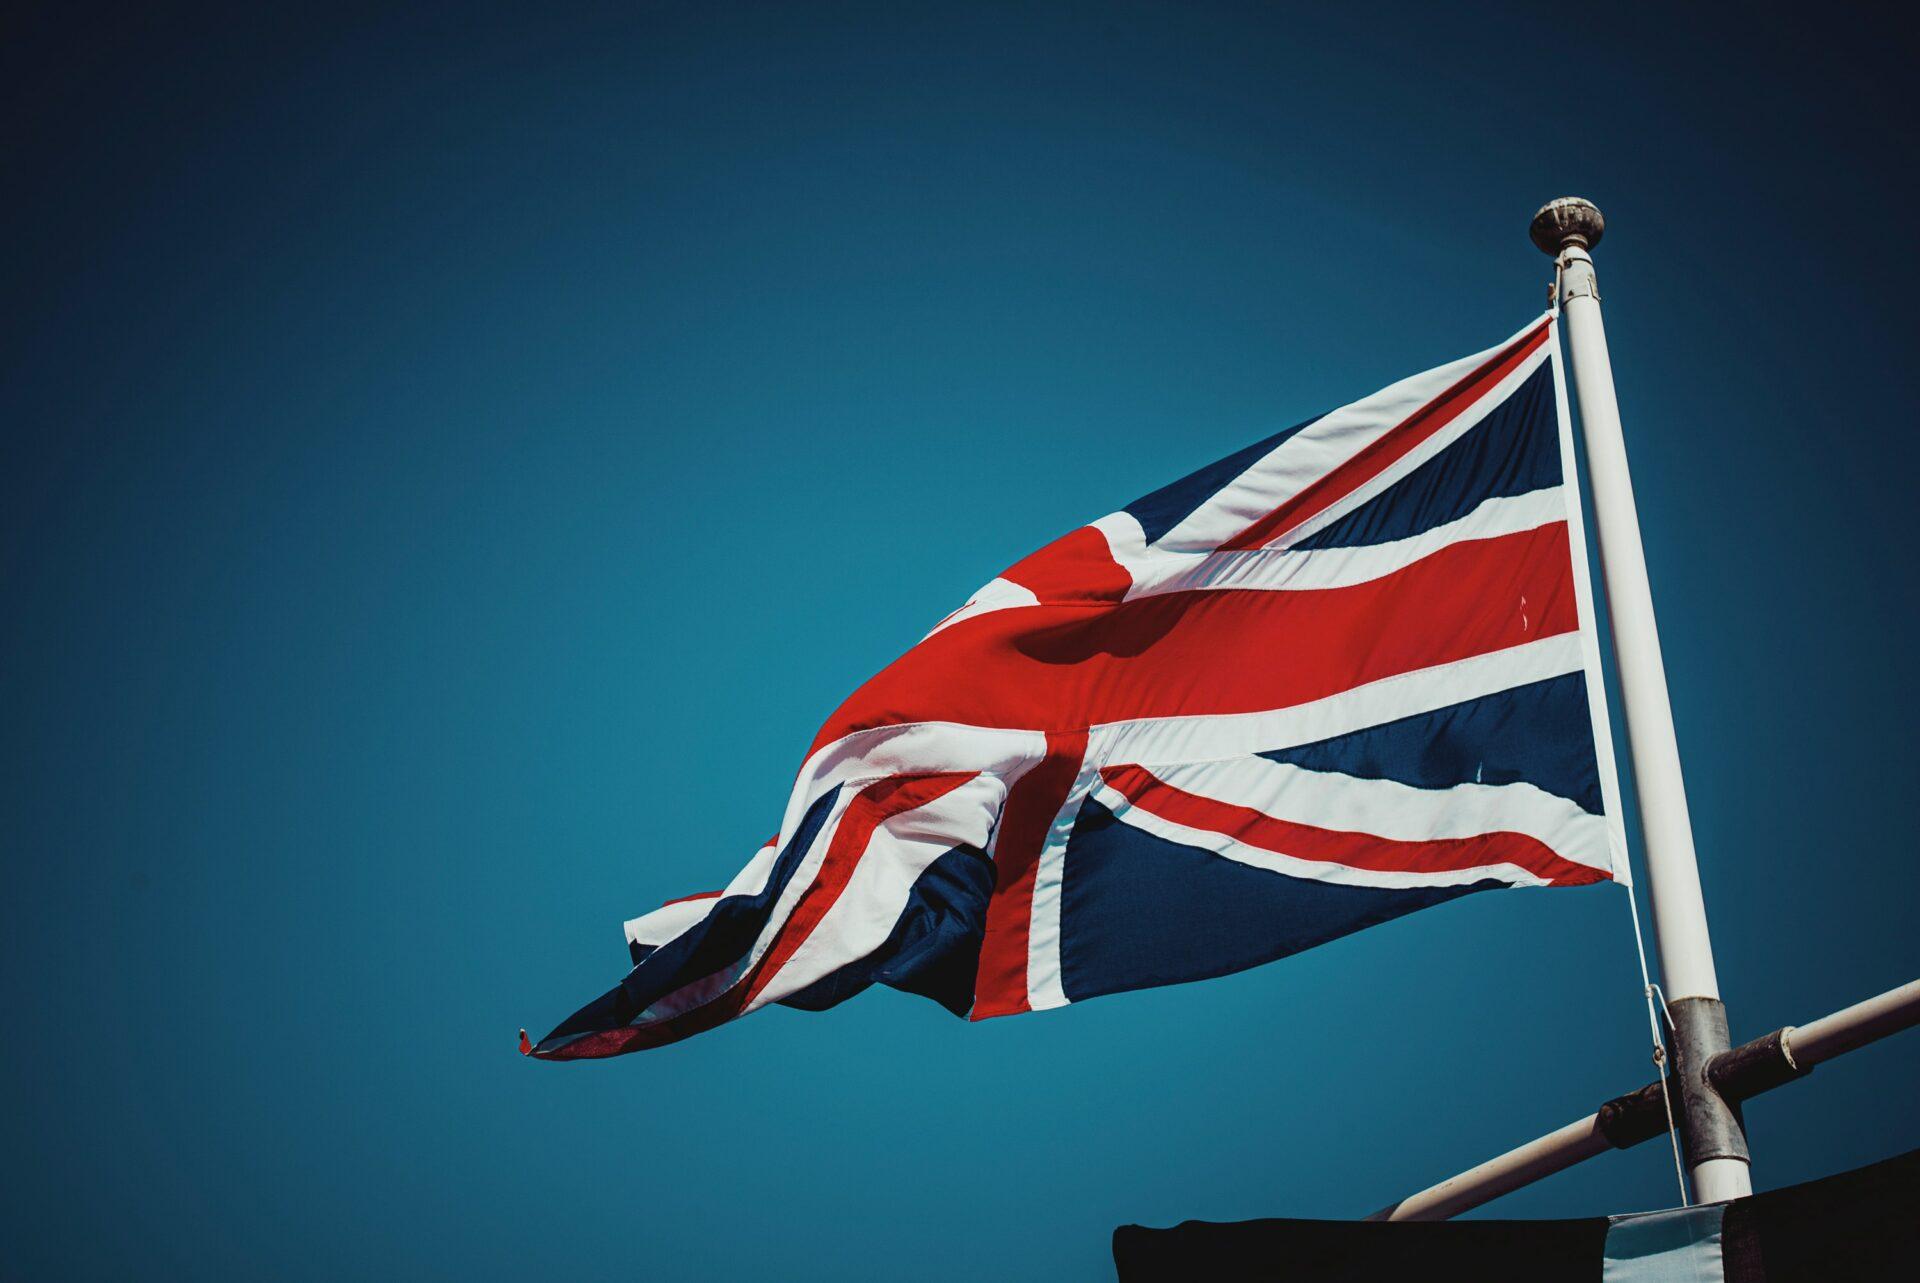 UK flag on a blue backdrop